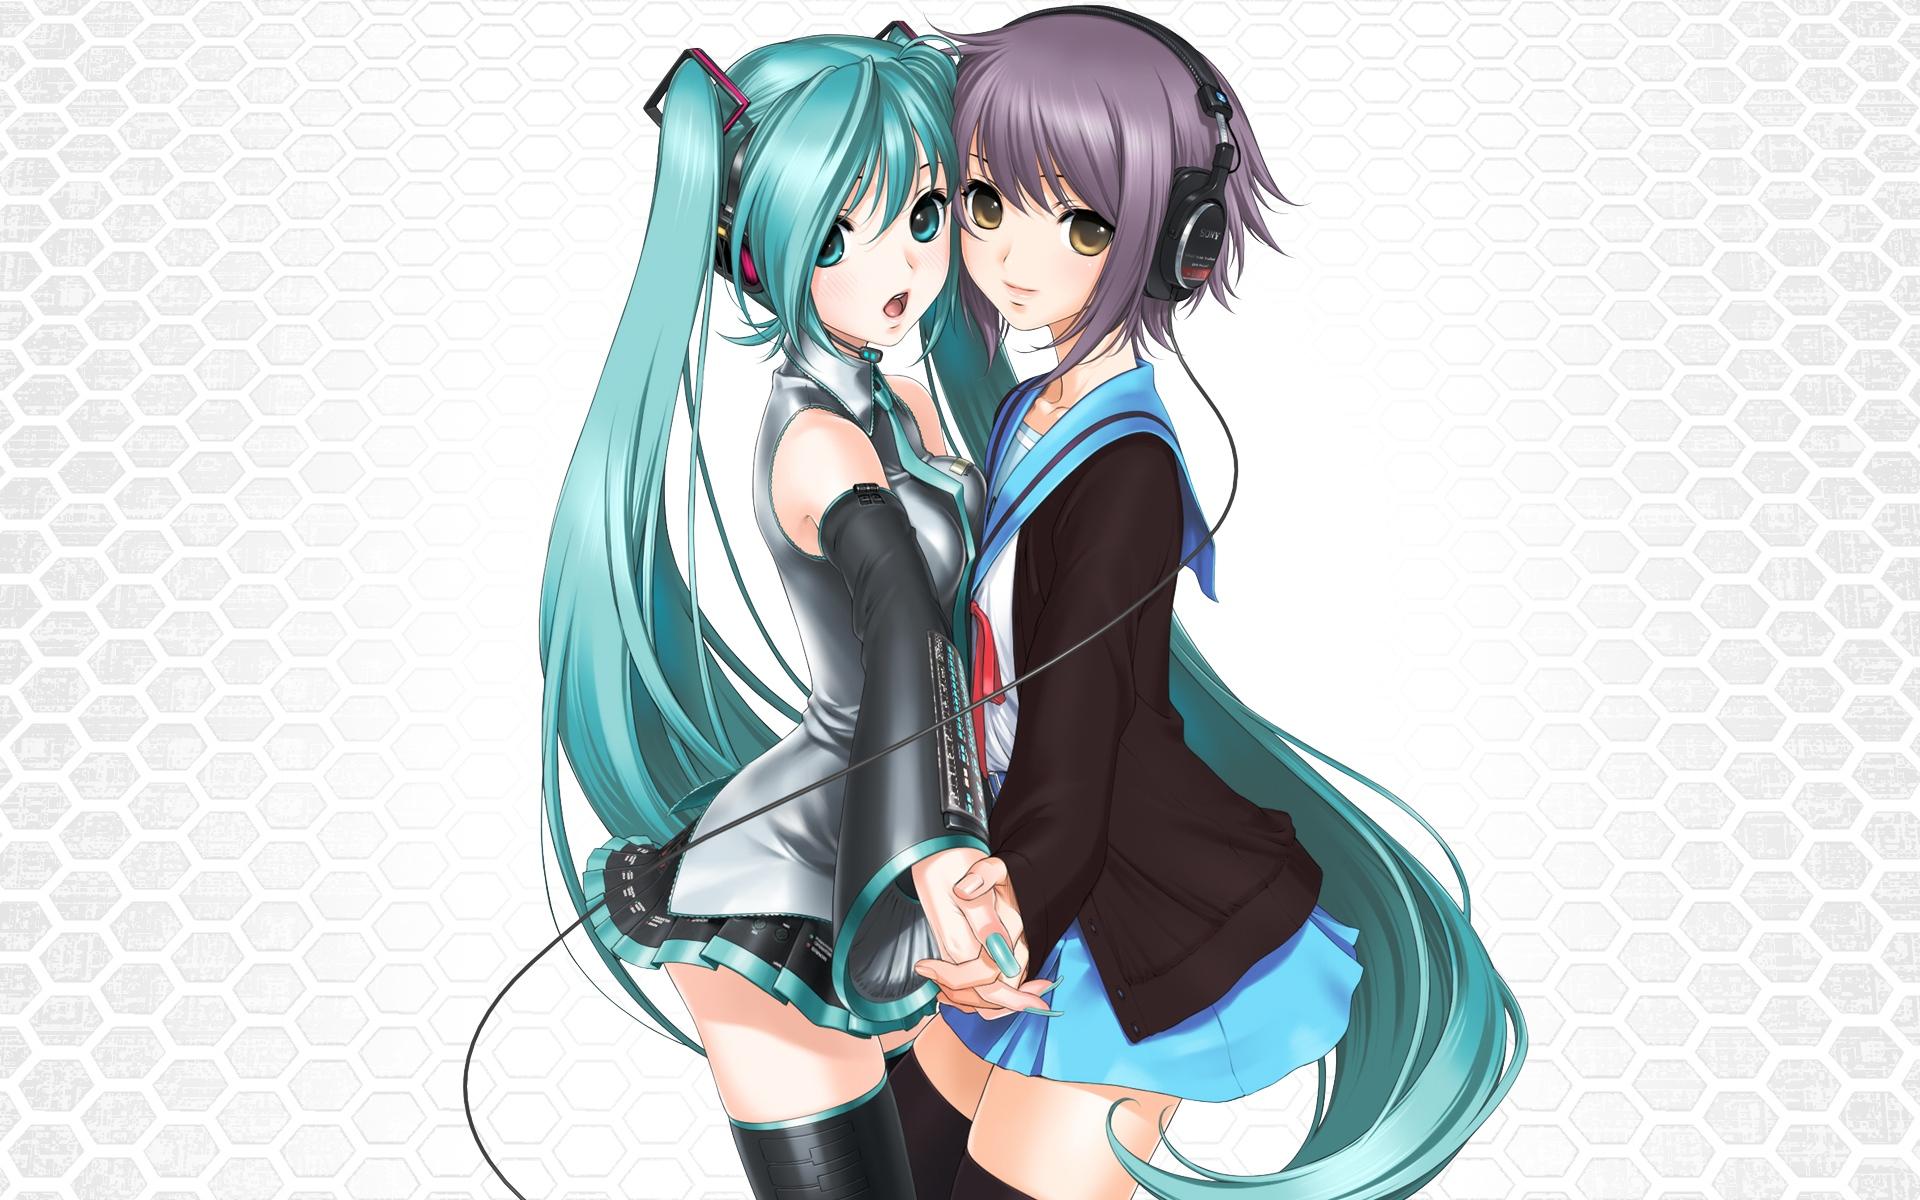 Haruhi and nagato hentai 3d lesbian sex adult tube